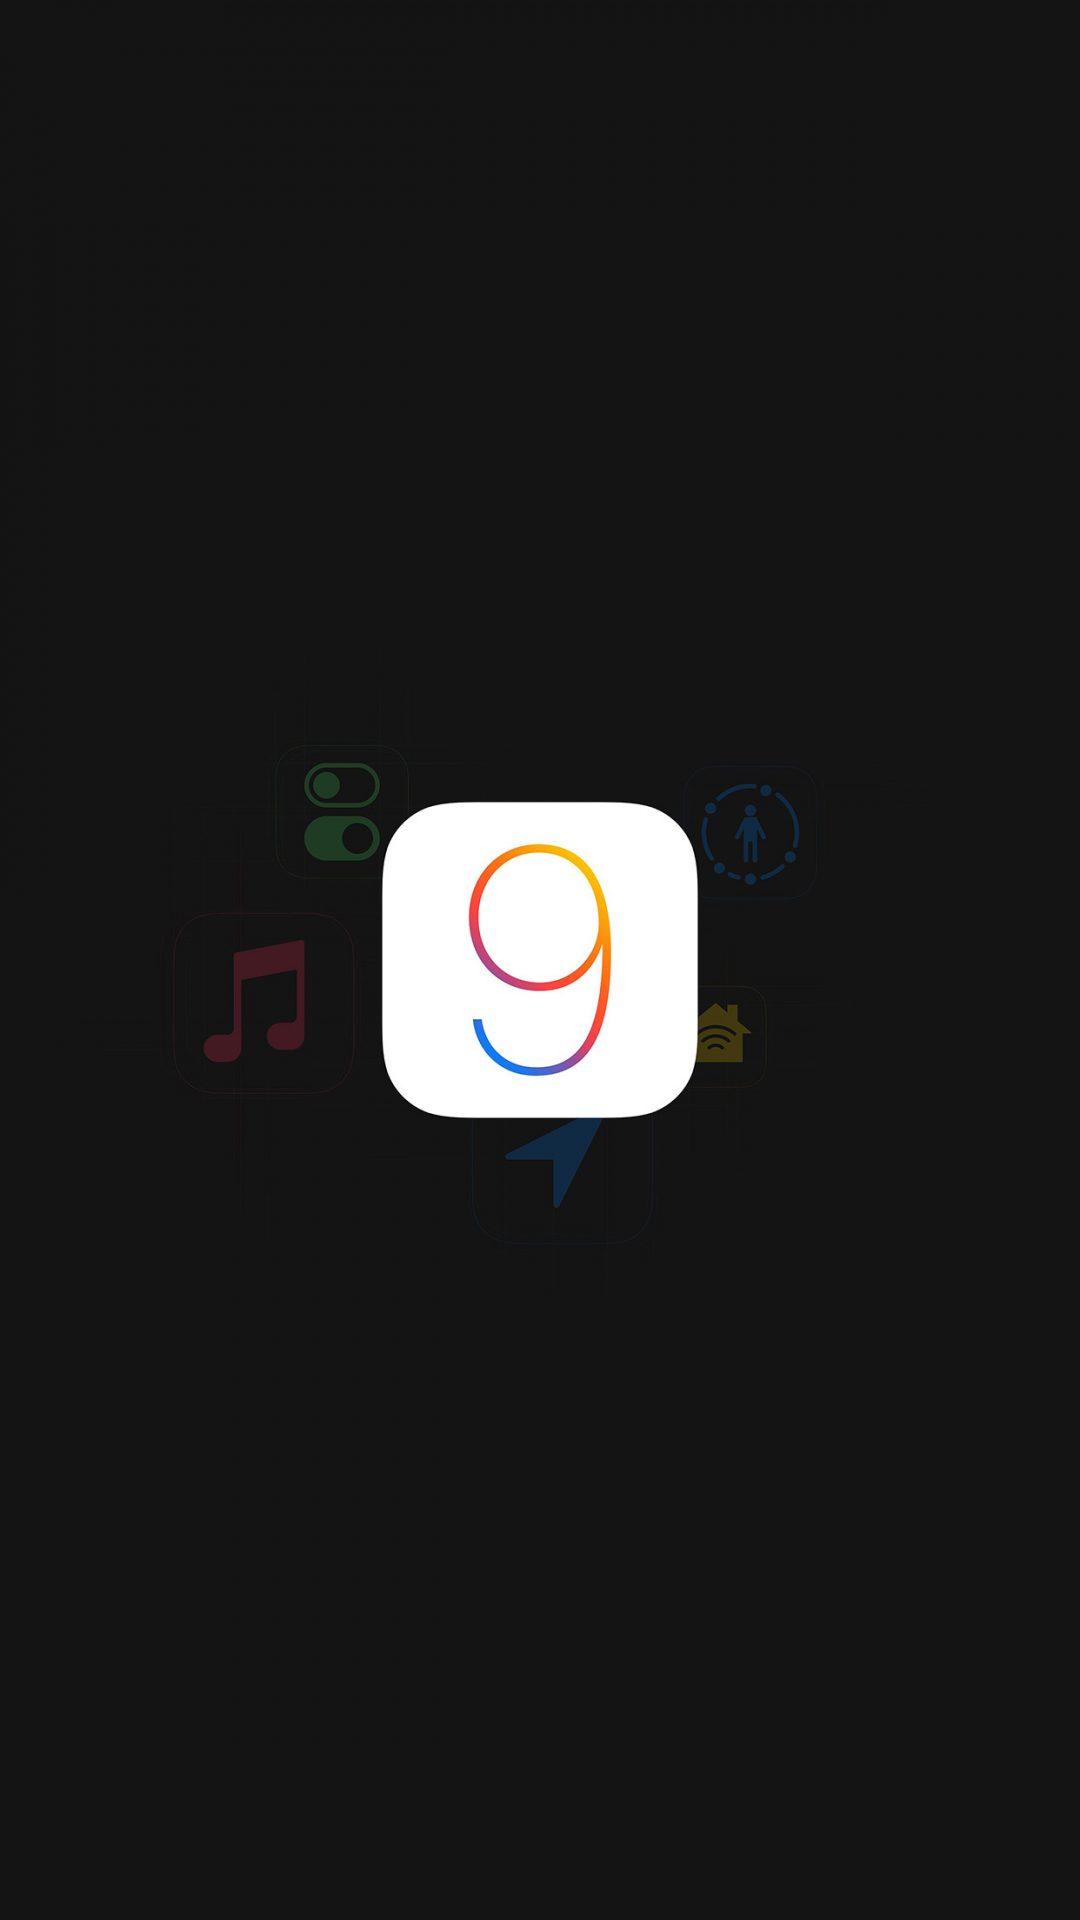 Apple IOS9 Logo Dark Simple Art